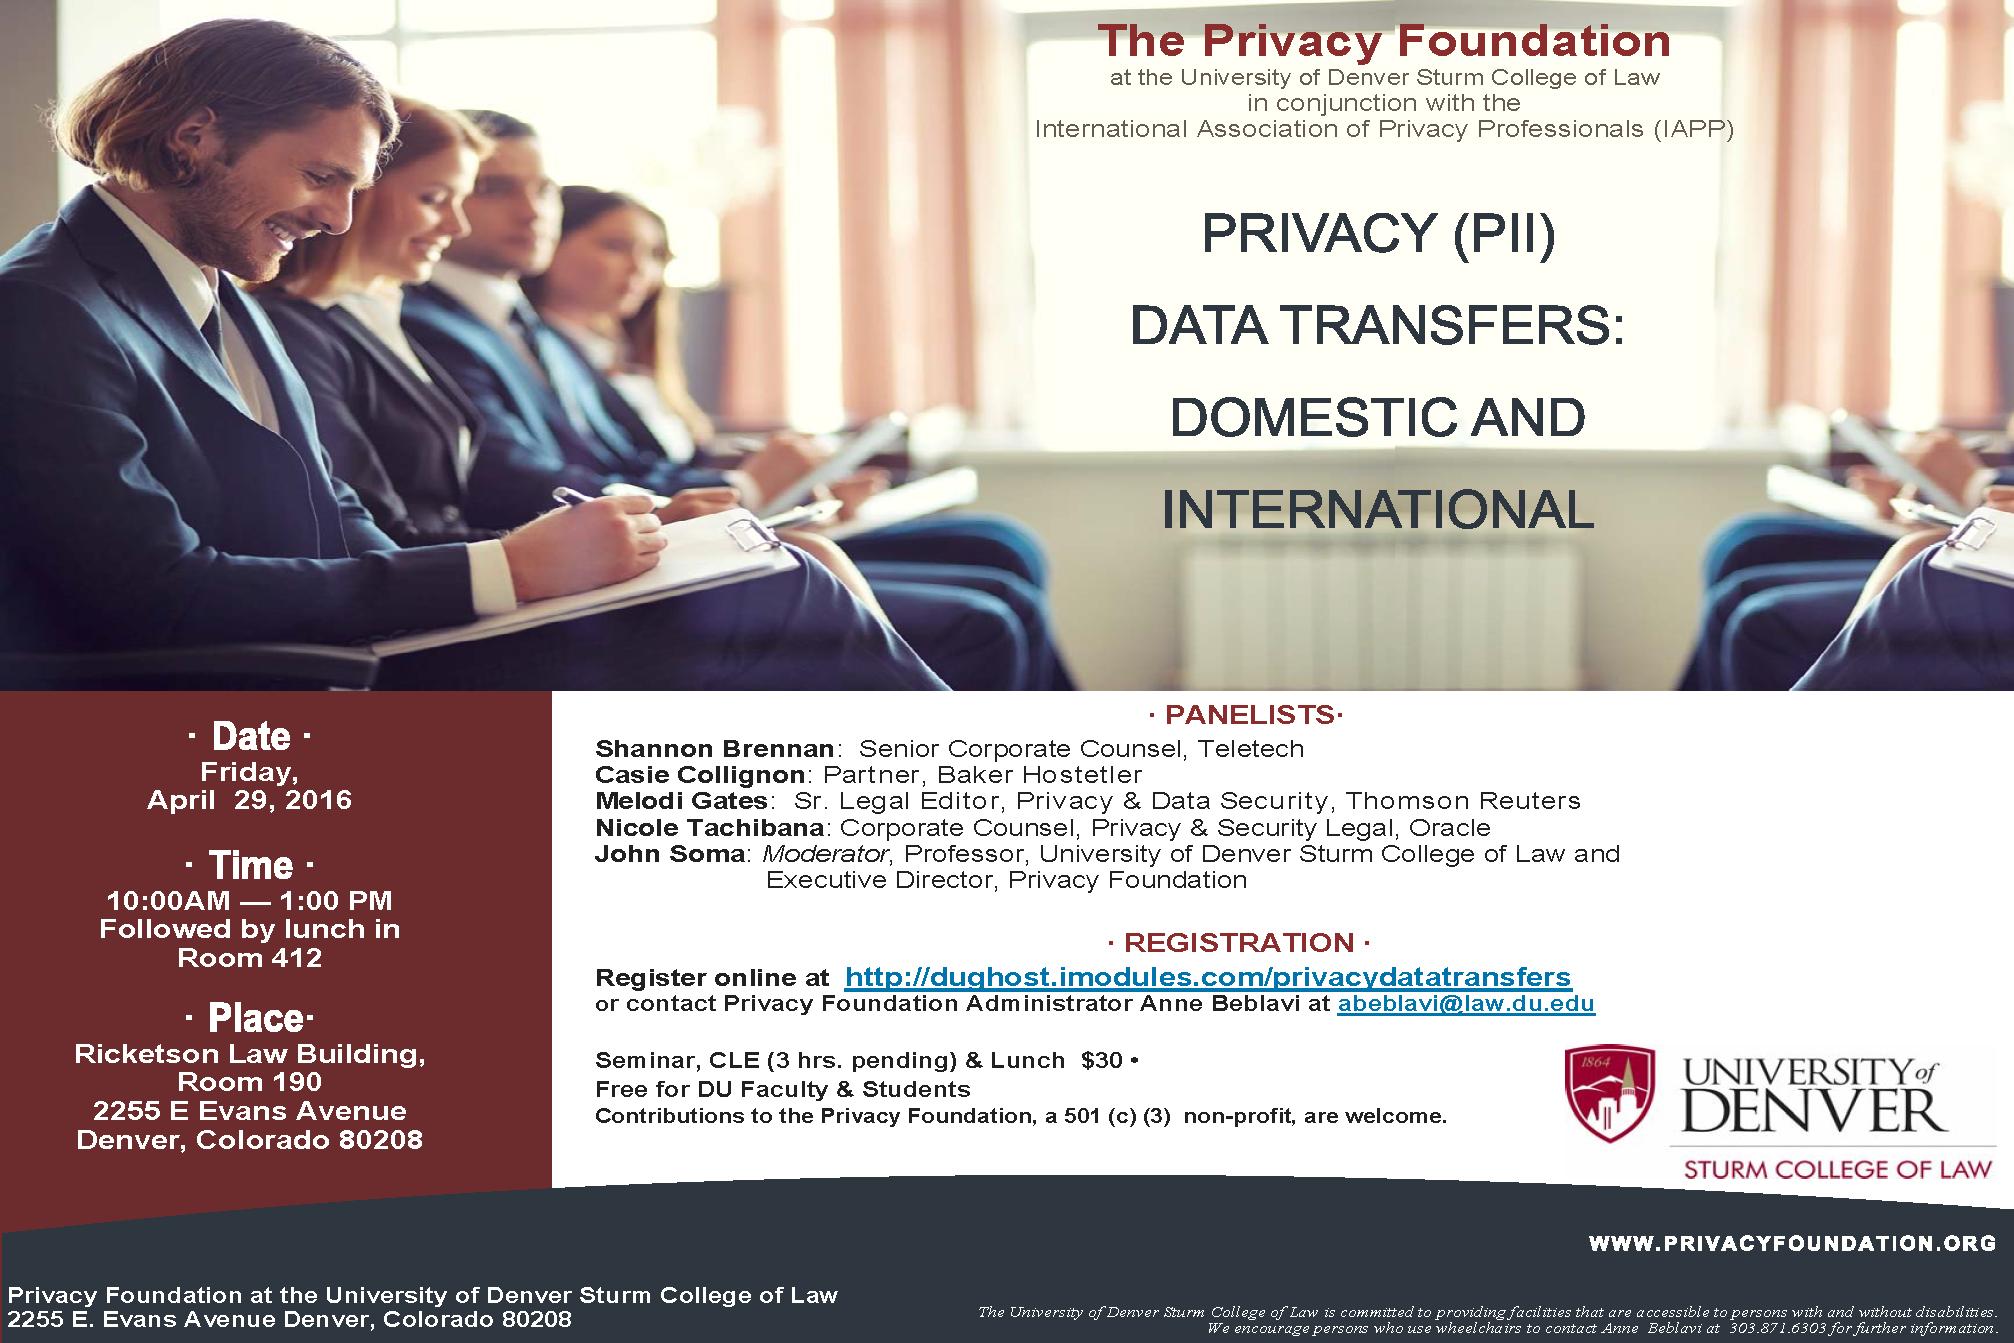 PRIVACY (PII) DATA TRANSFERS flier